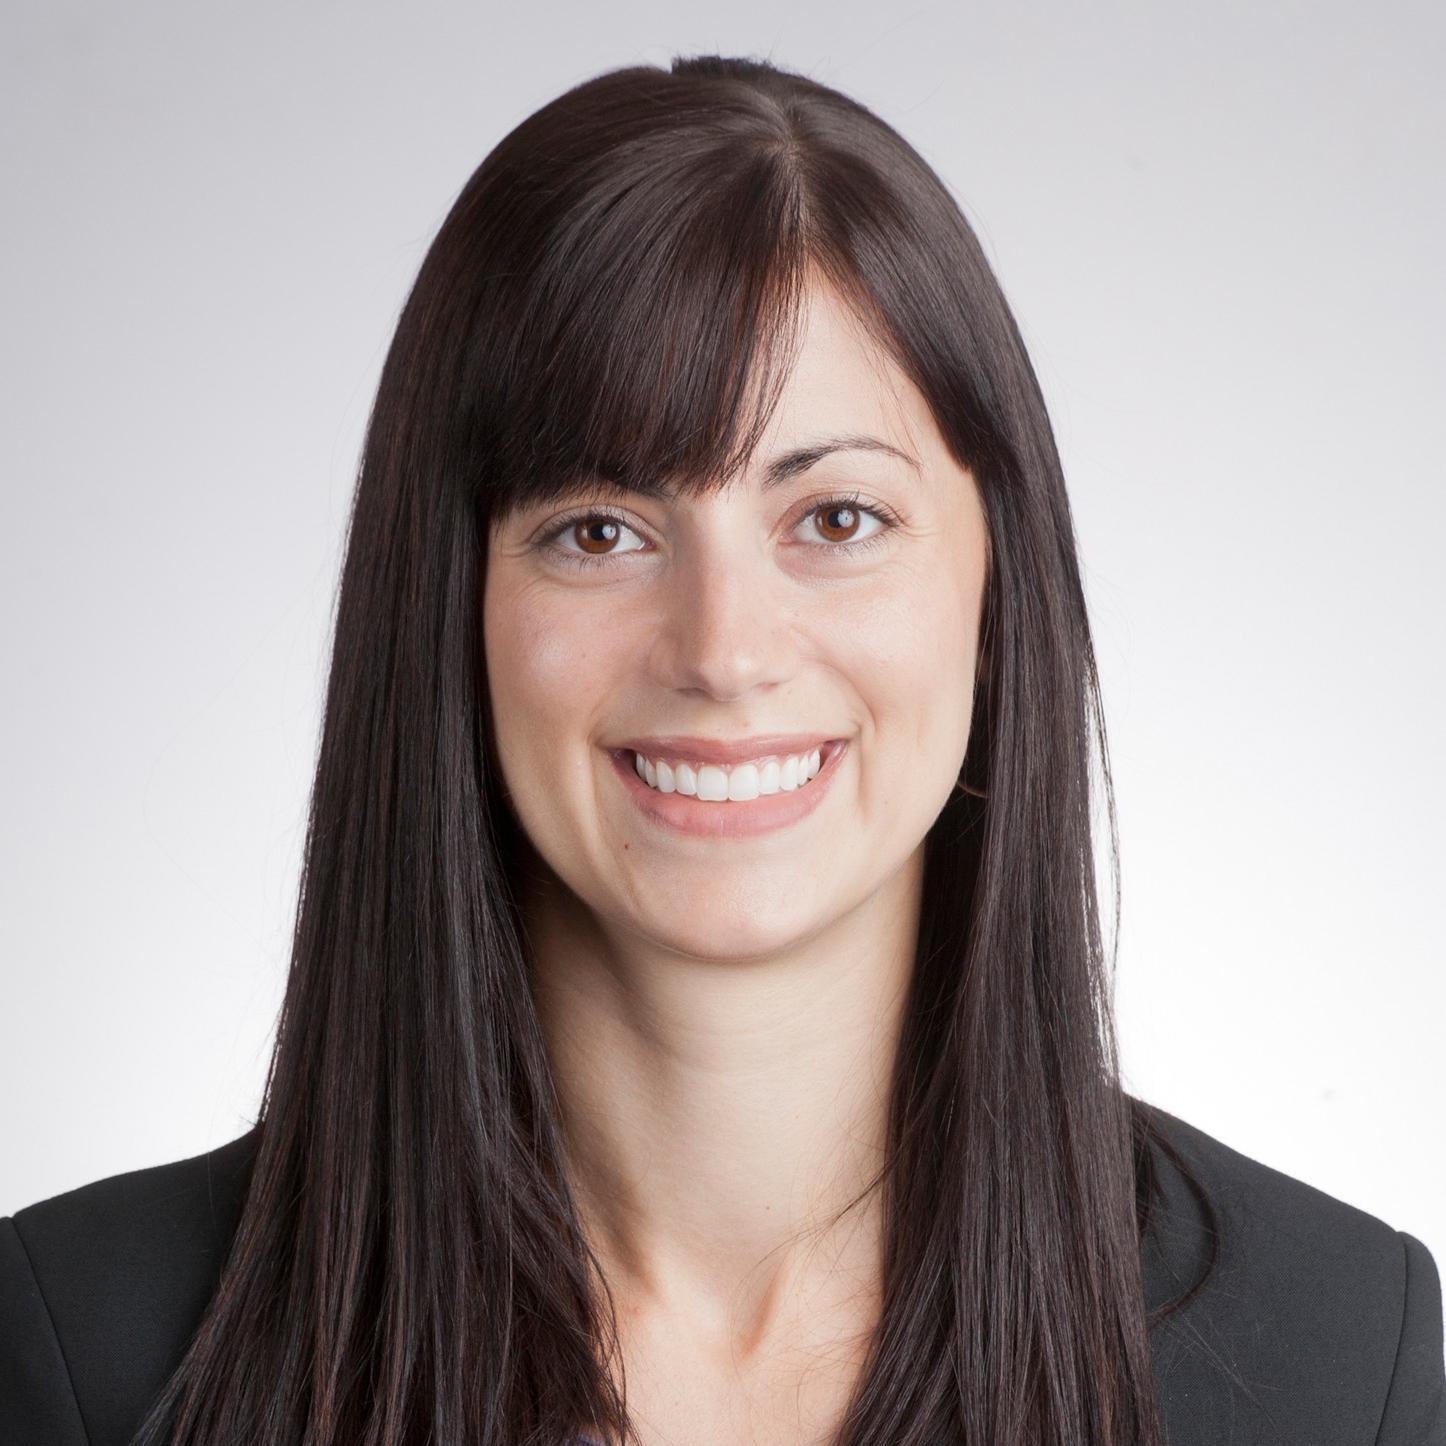 Alexandra Papasifakis - New